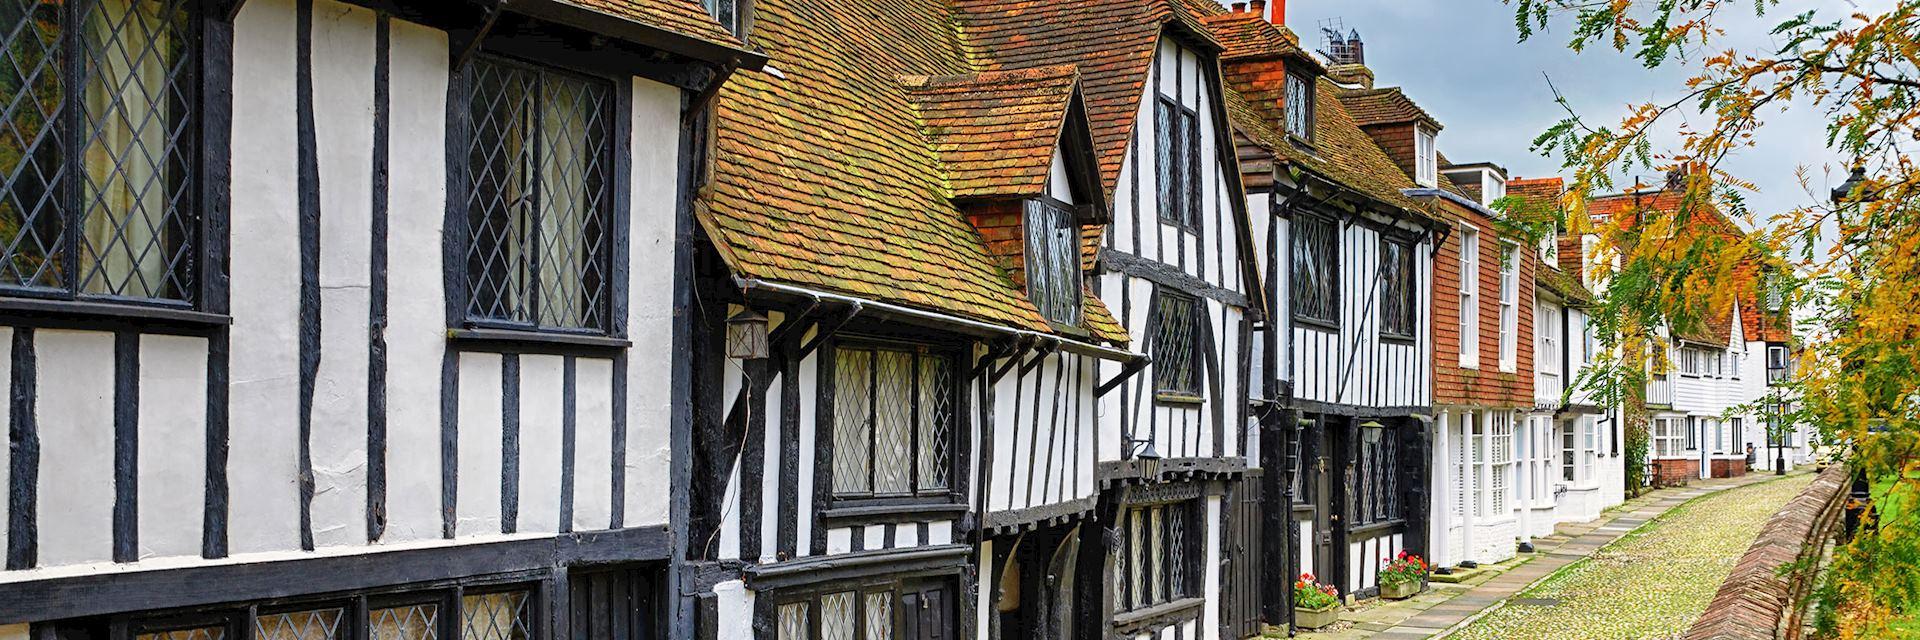 Street of quaint houses, Rye